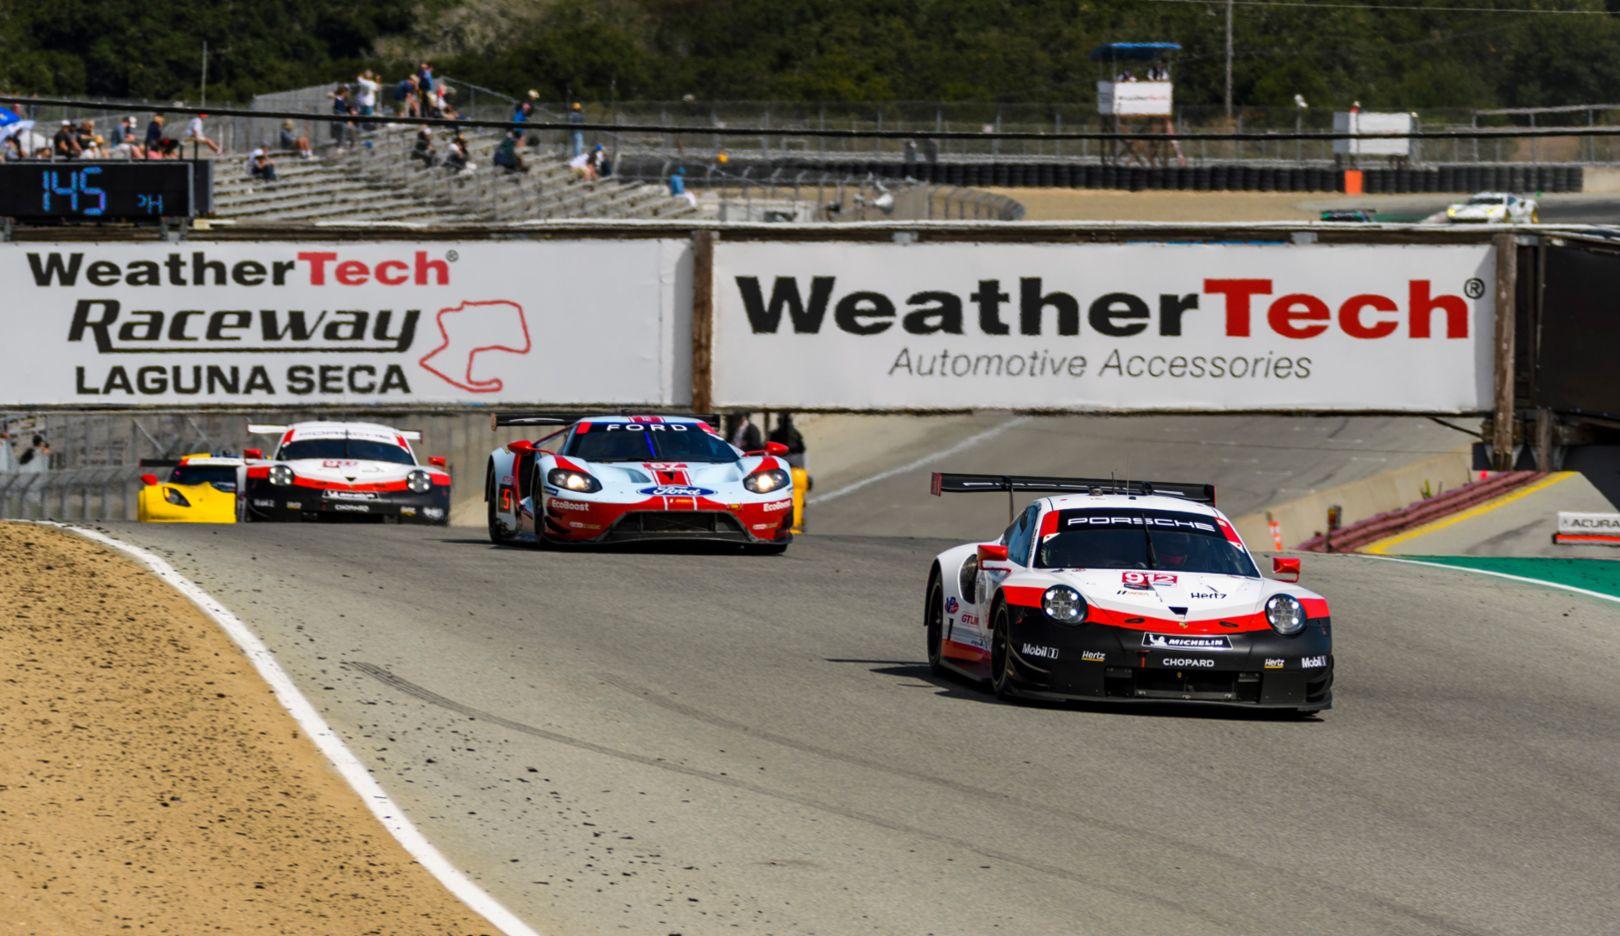 Laguna Seca Raceway >> Imsa Porsche Scores Vital Points On The Way To A Possible